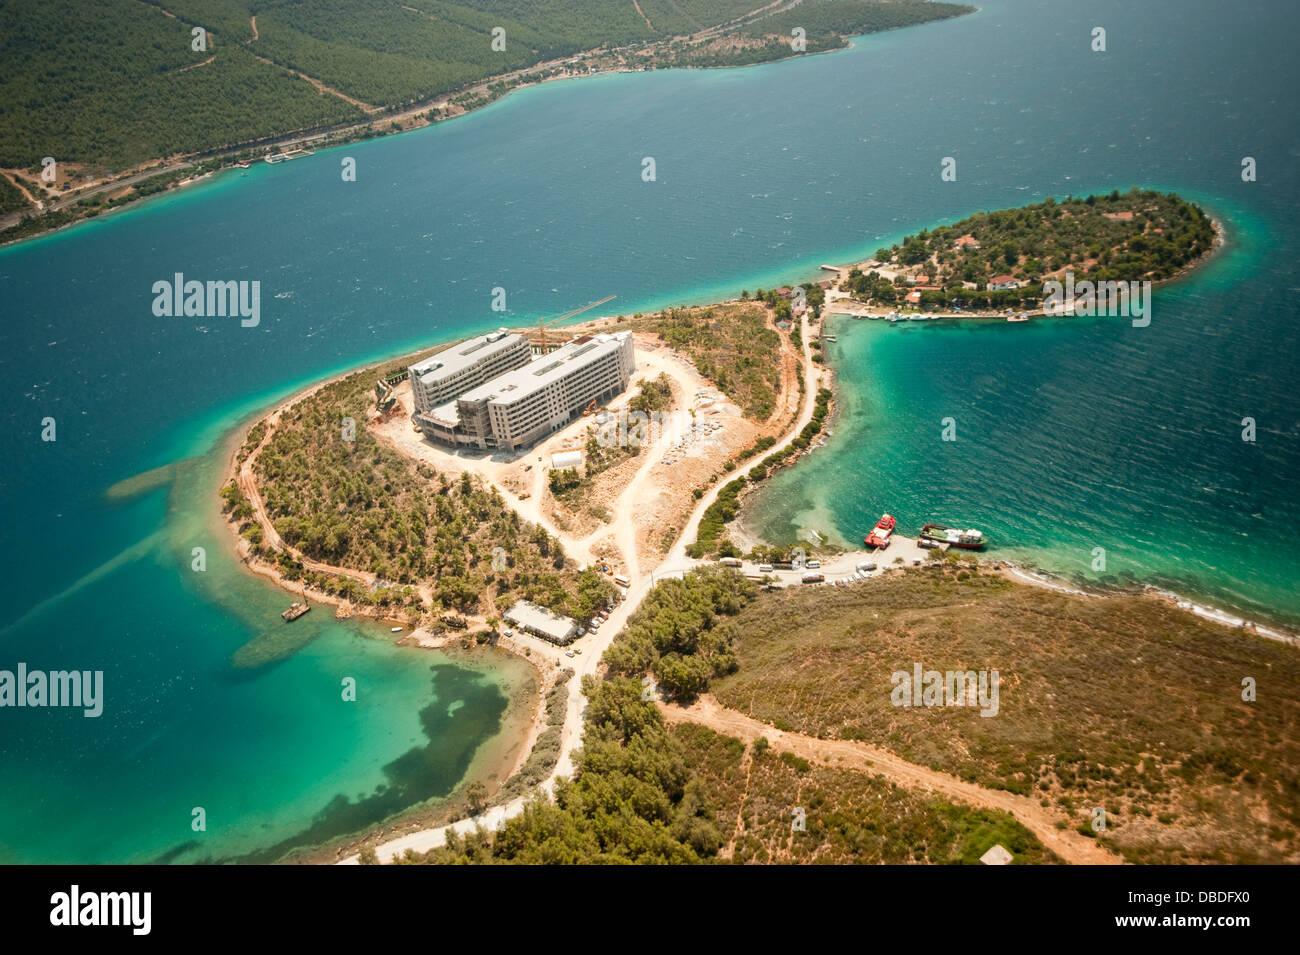 Aerial view of coastal development hotel contruction and environmental impact in Güllük Bay Bodrum Turkey - Stock Image